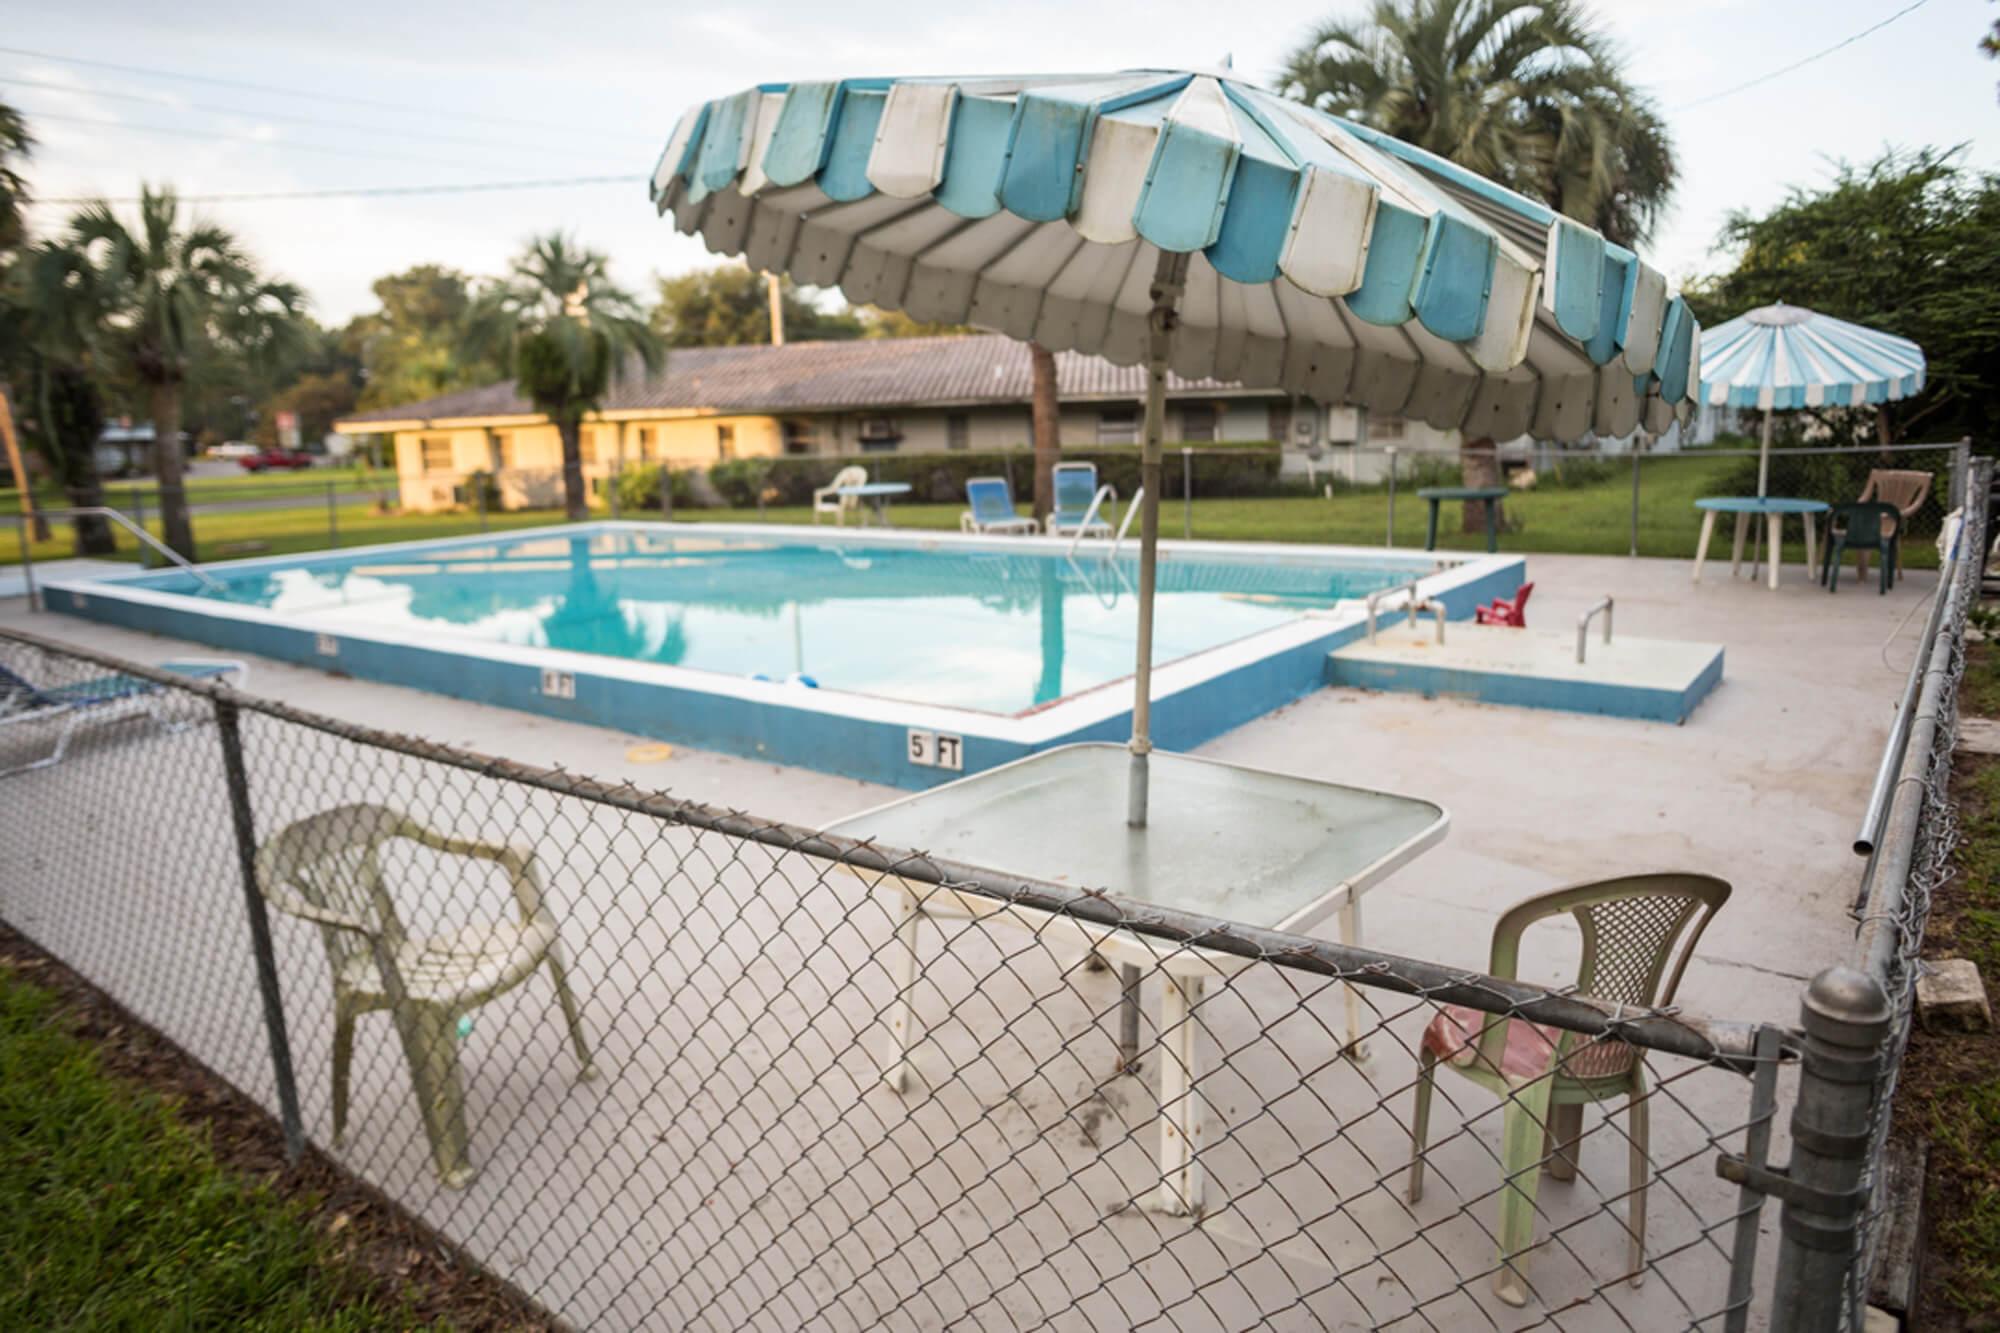 Silver Springs Motel pool and umbrellas.